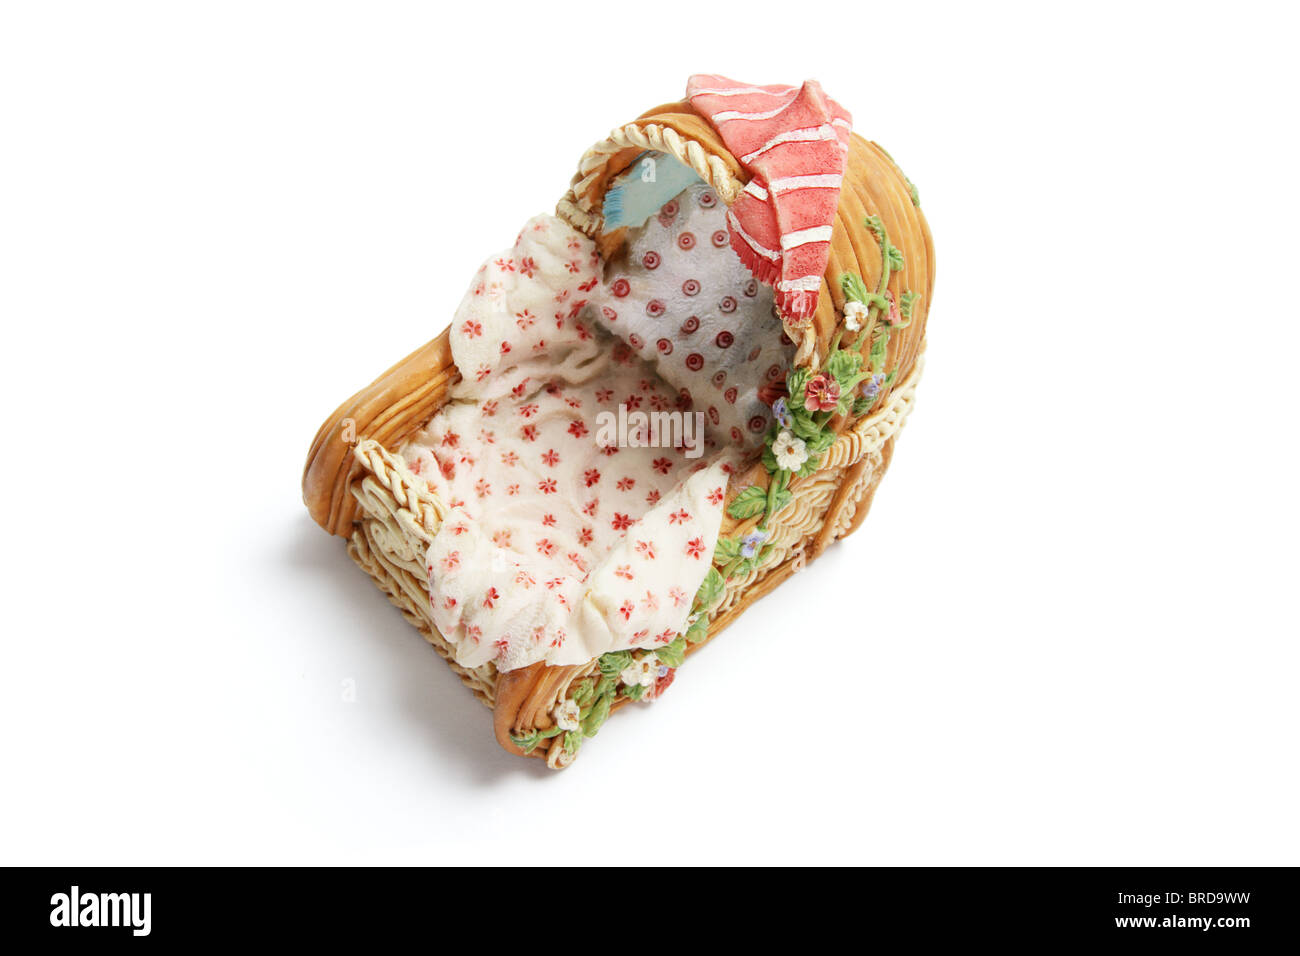 Miniatur stubenwagen stockfoto bild: 31640613 alamy